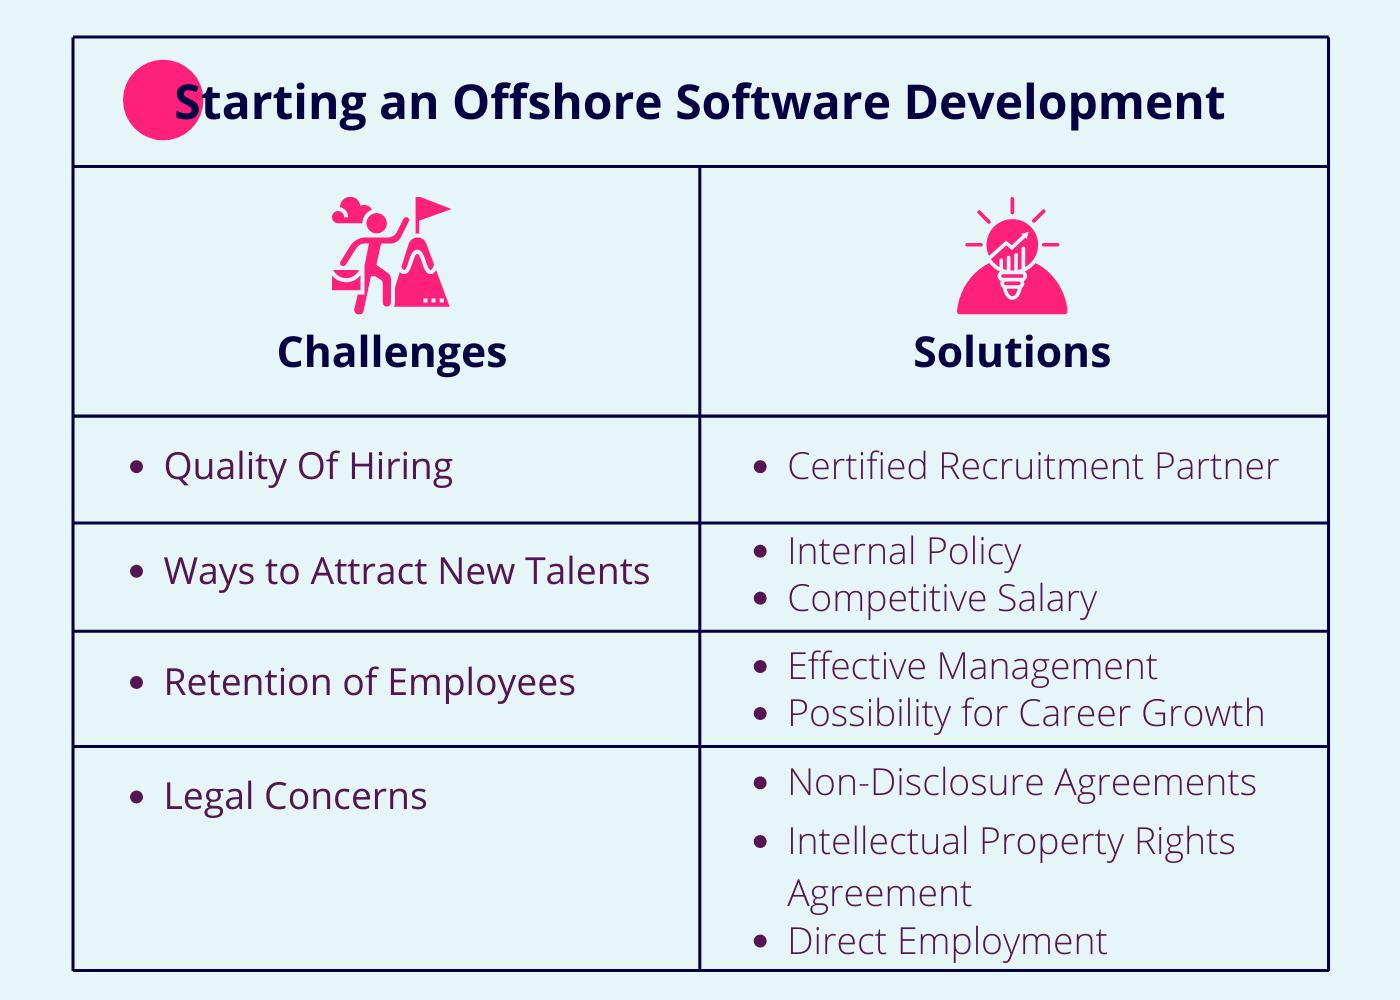 challenges-of-offshore-development